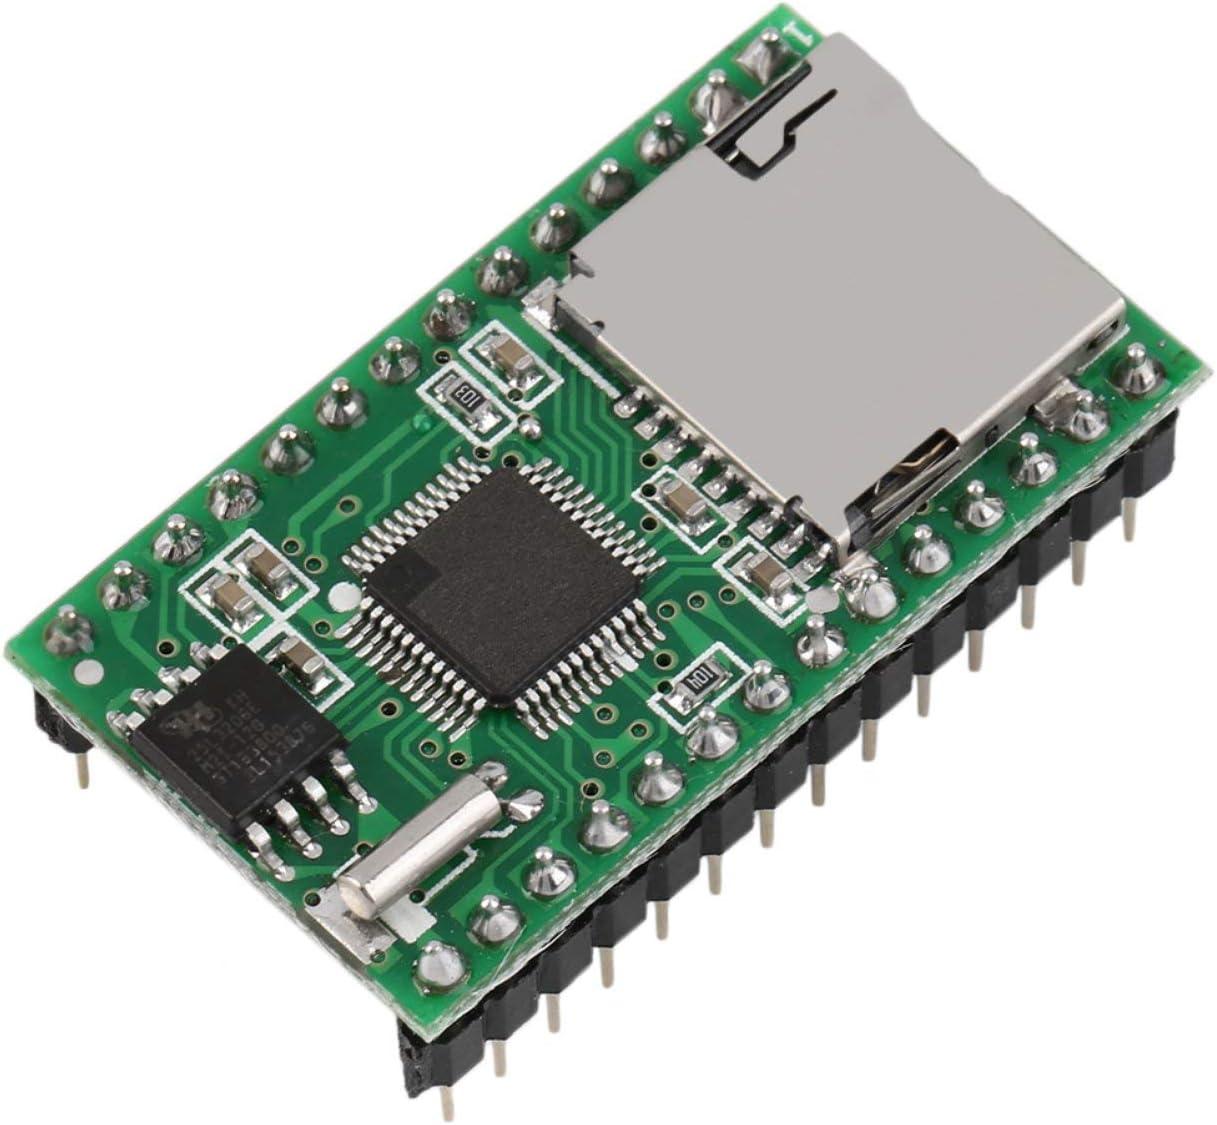 Sound Module WT5001M02-28P U-Disk Audio Player Card Voice Module MP3 Sound for Arduino Green